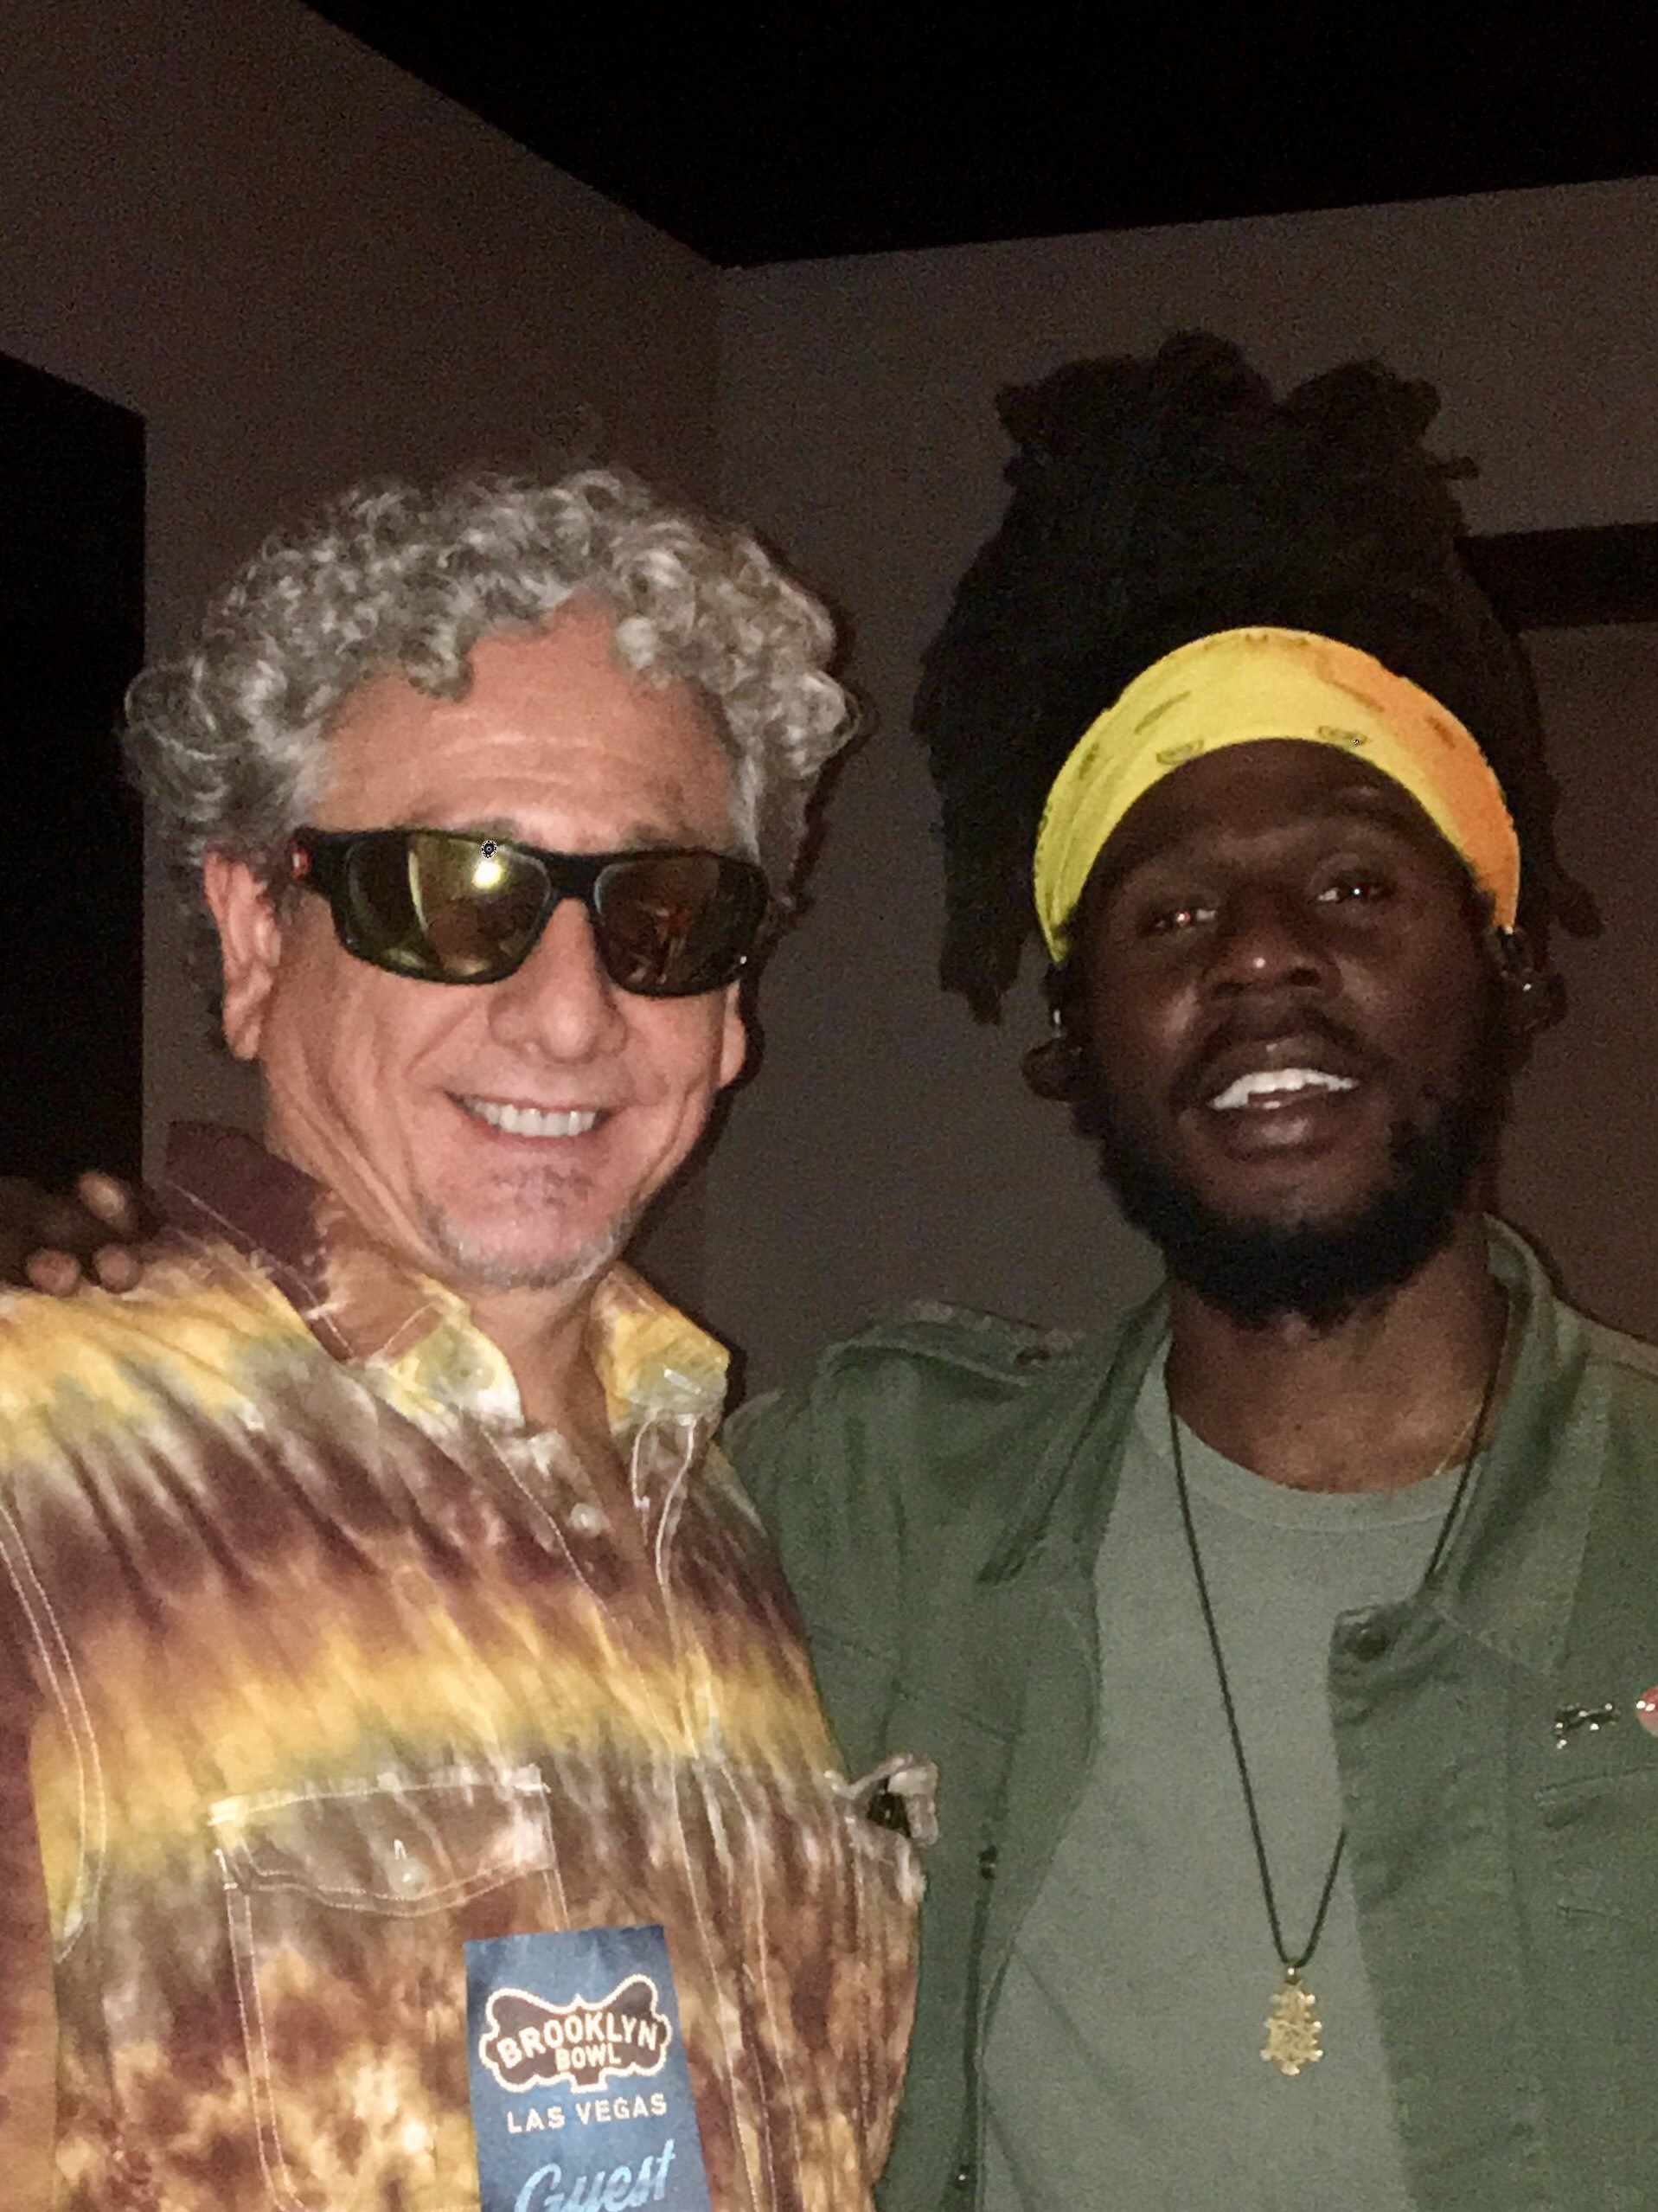 'with Chronixx in Las Vegas 2017